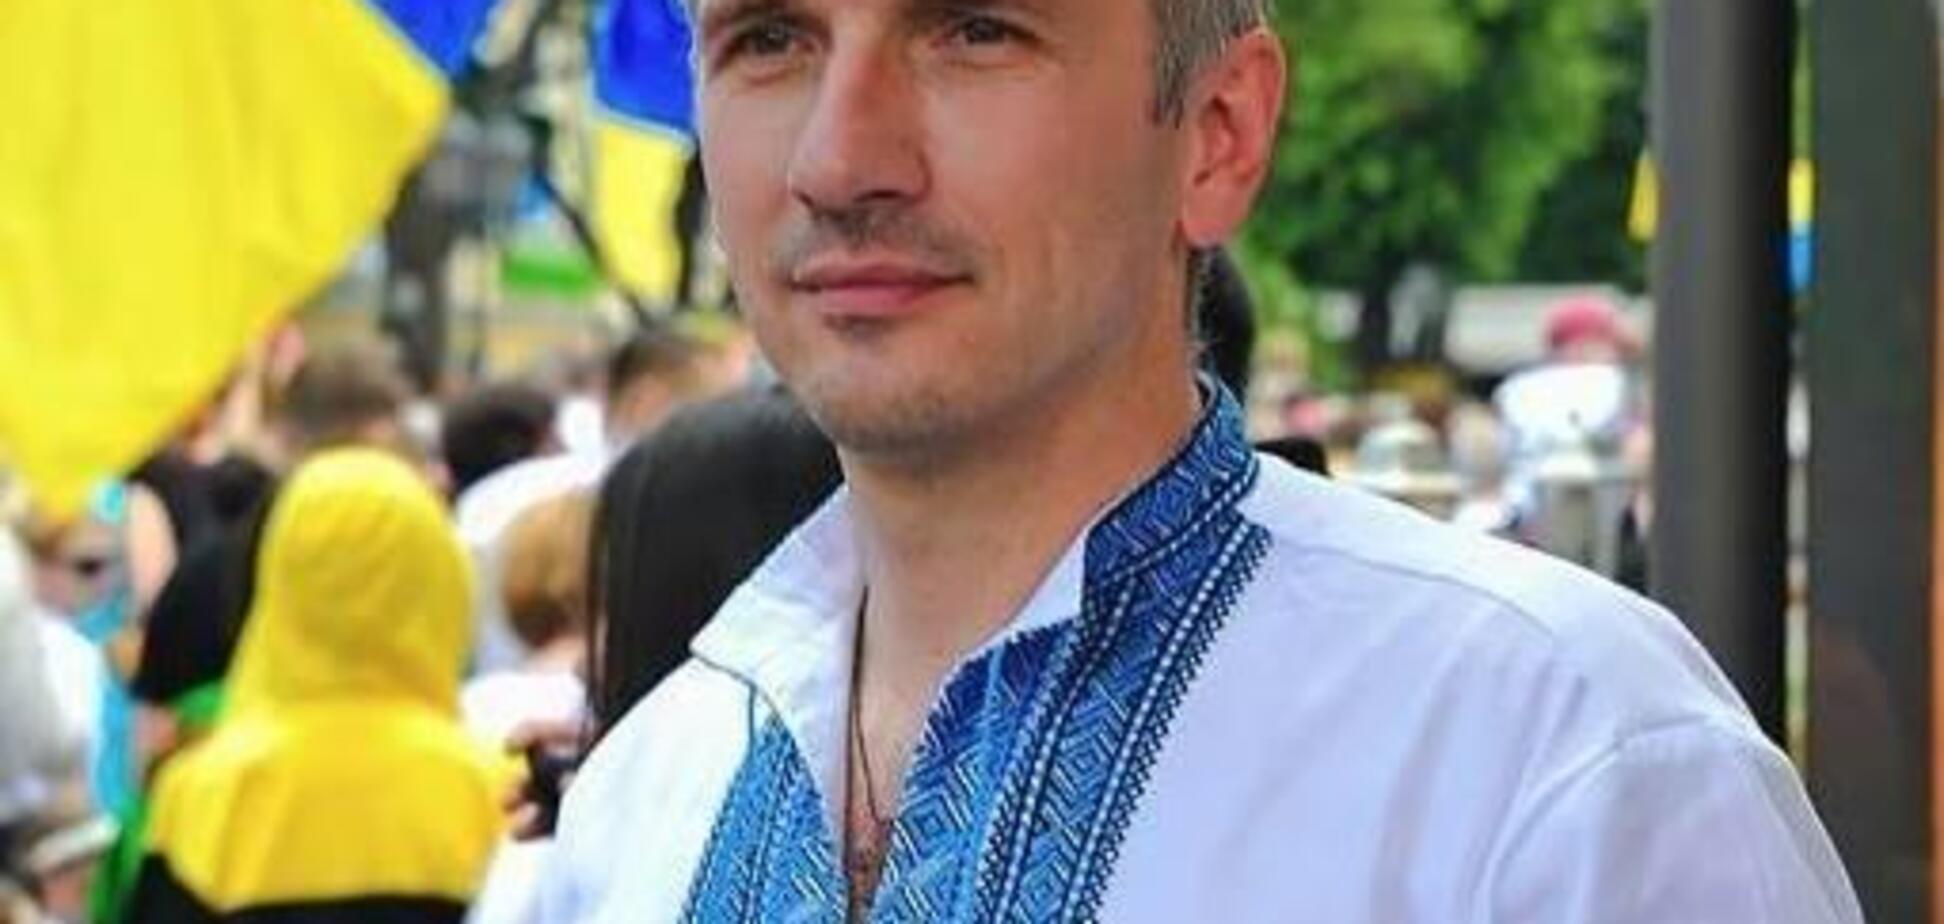 Пуля в грудь: в Одессе стреляли в известного активиста